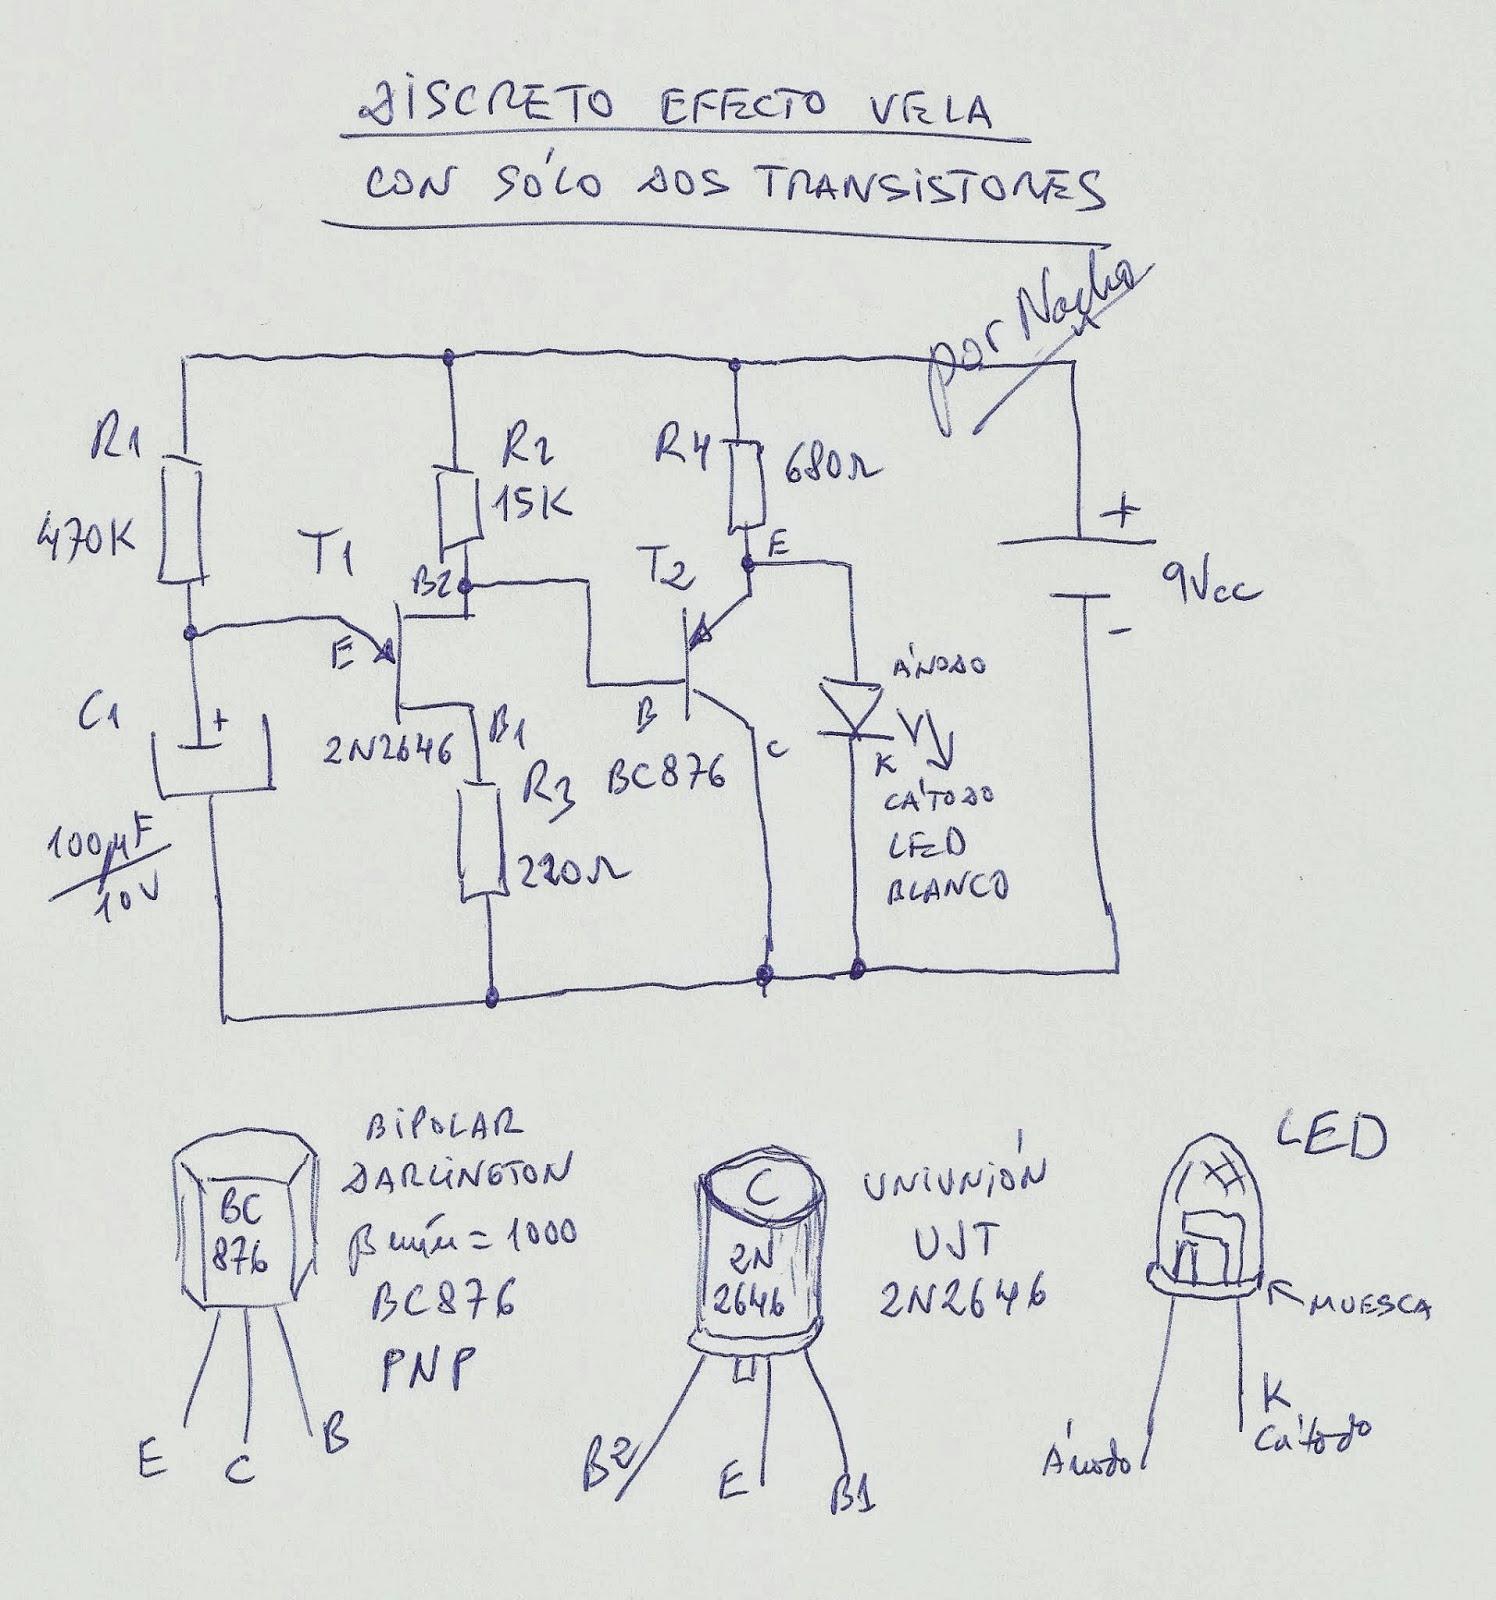 Circuito Discreto : Cotidiana place discreto efecto vela con sólo dos transistores